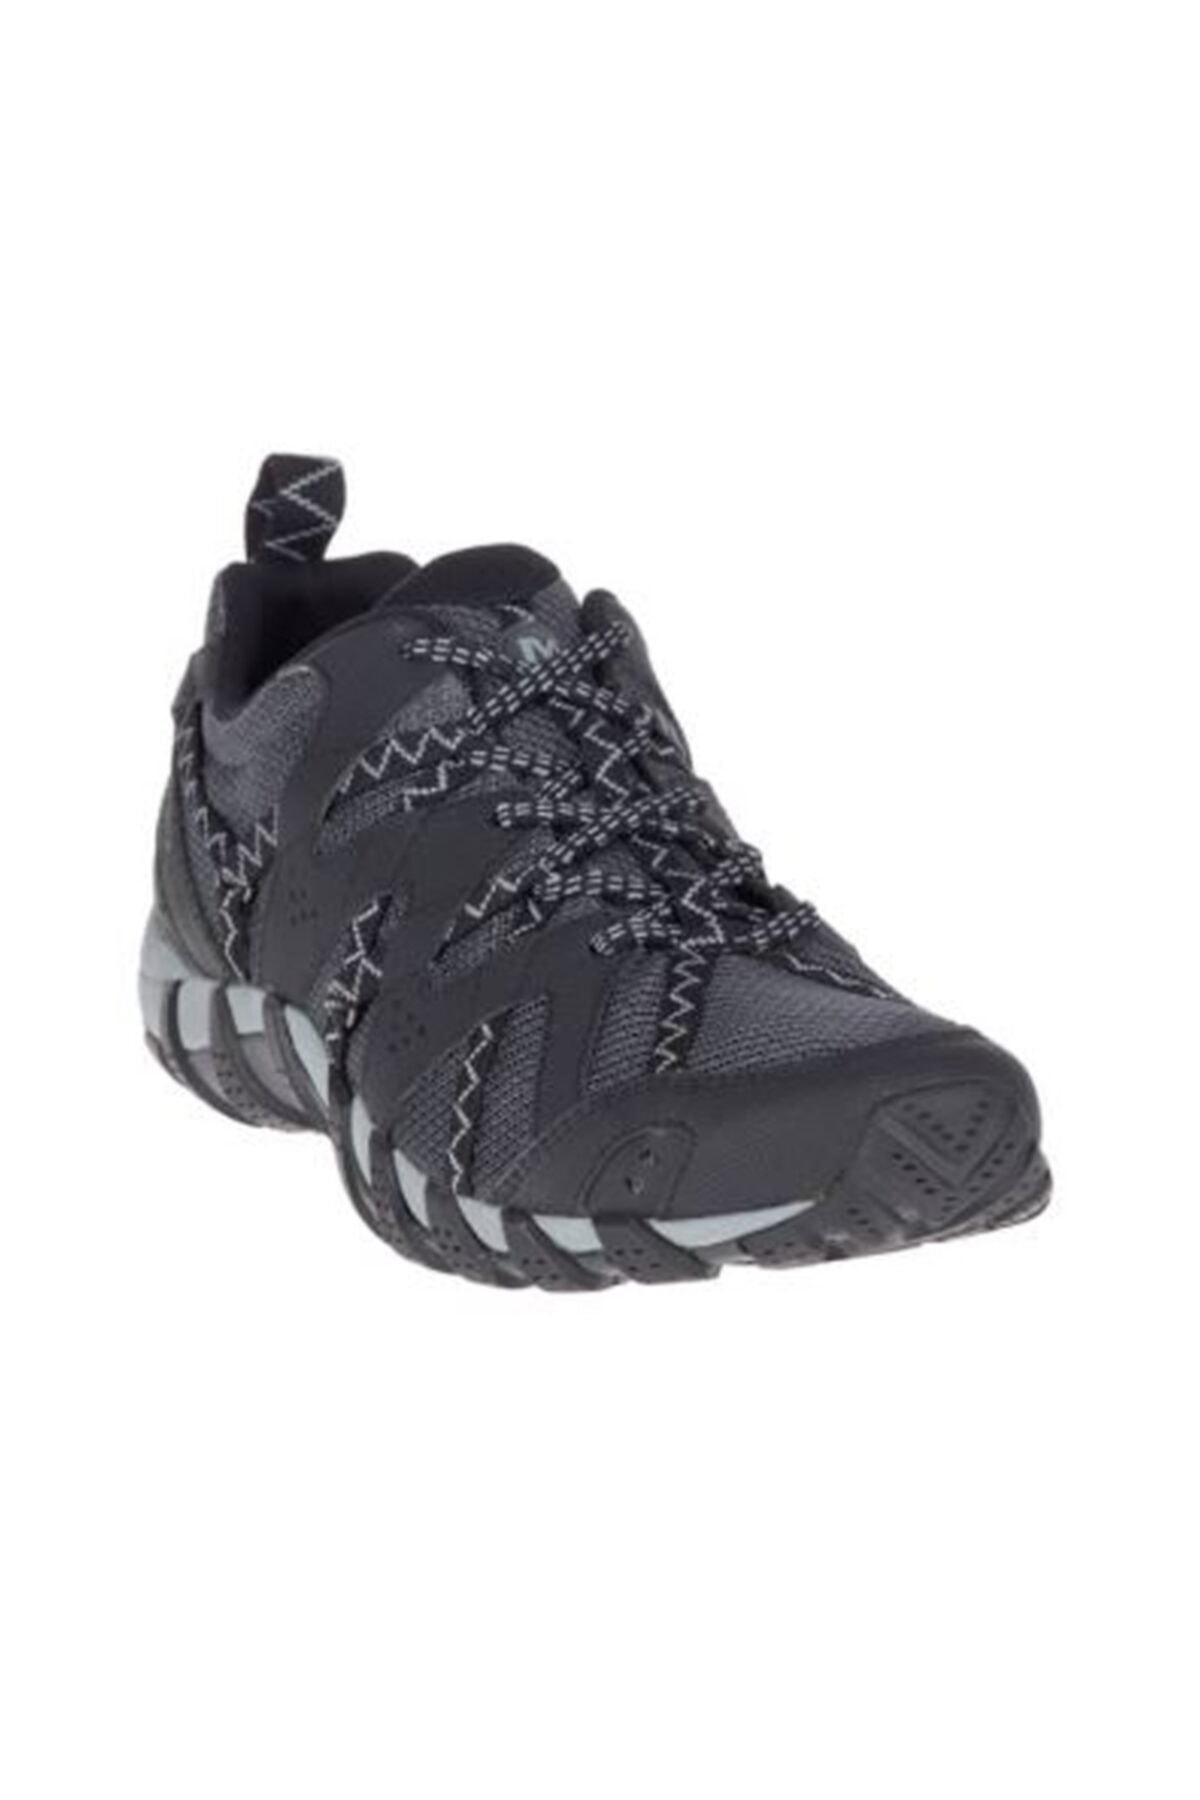 WATERPRO MAIPO 2 Siyah Kadın Outdoor Ayakkabı 100444039